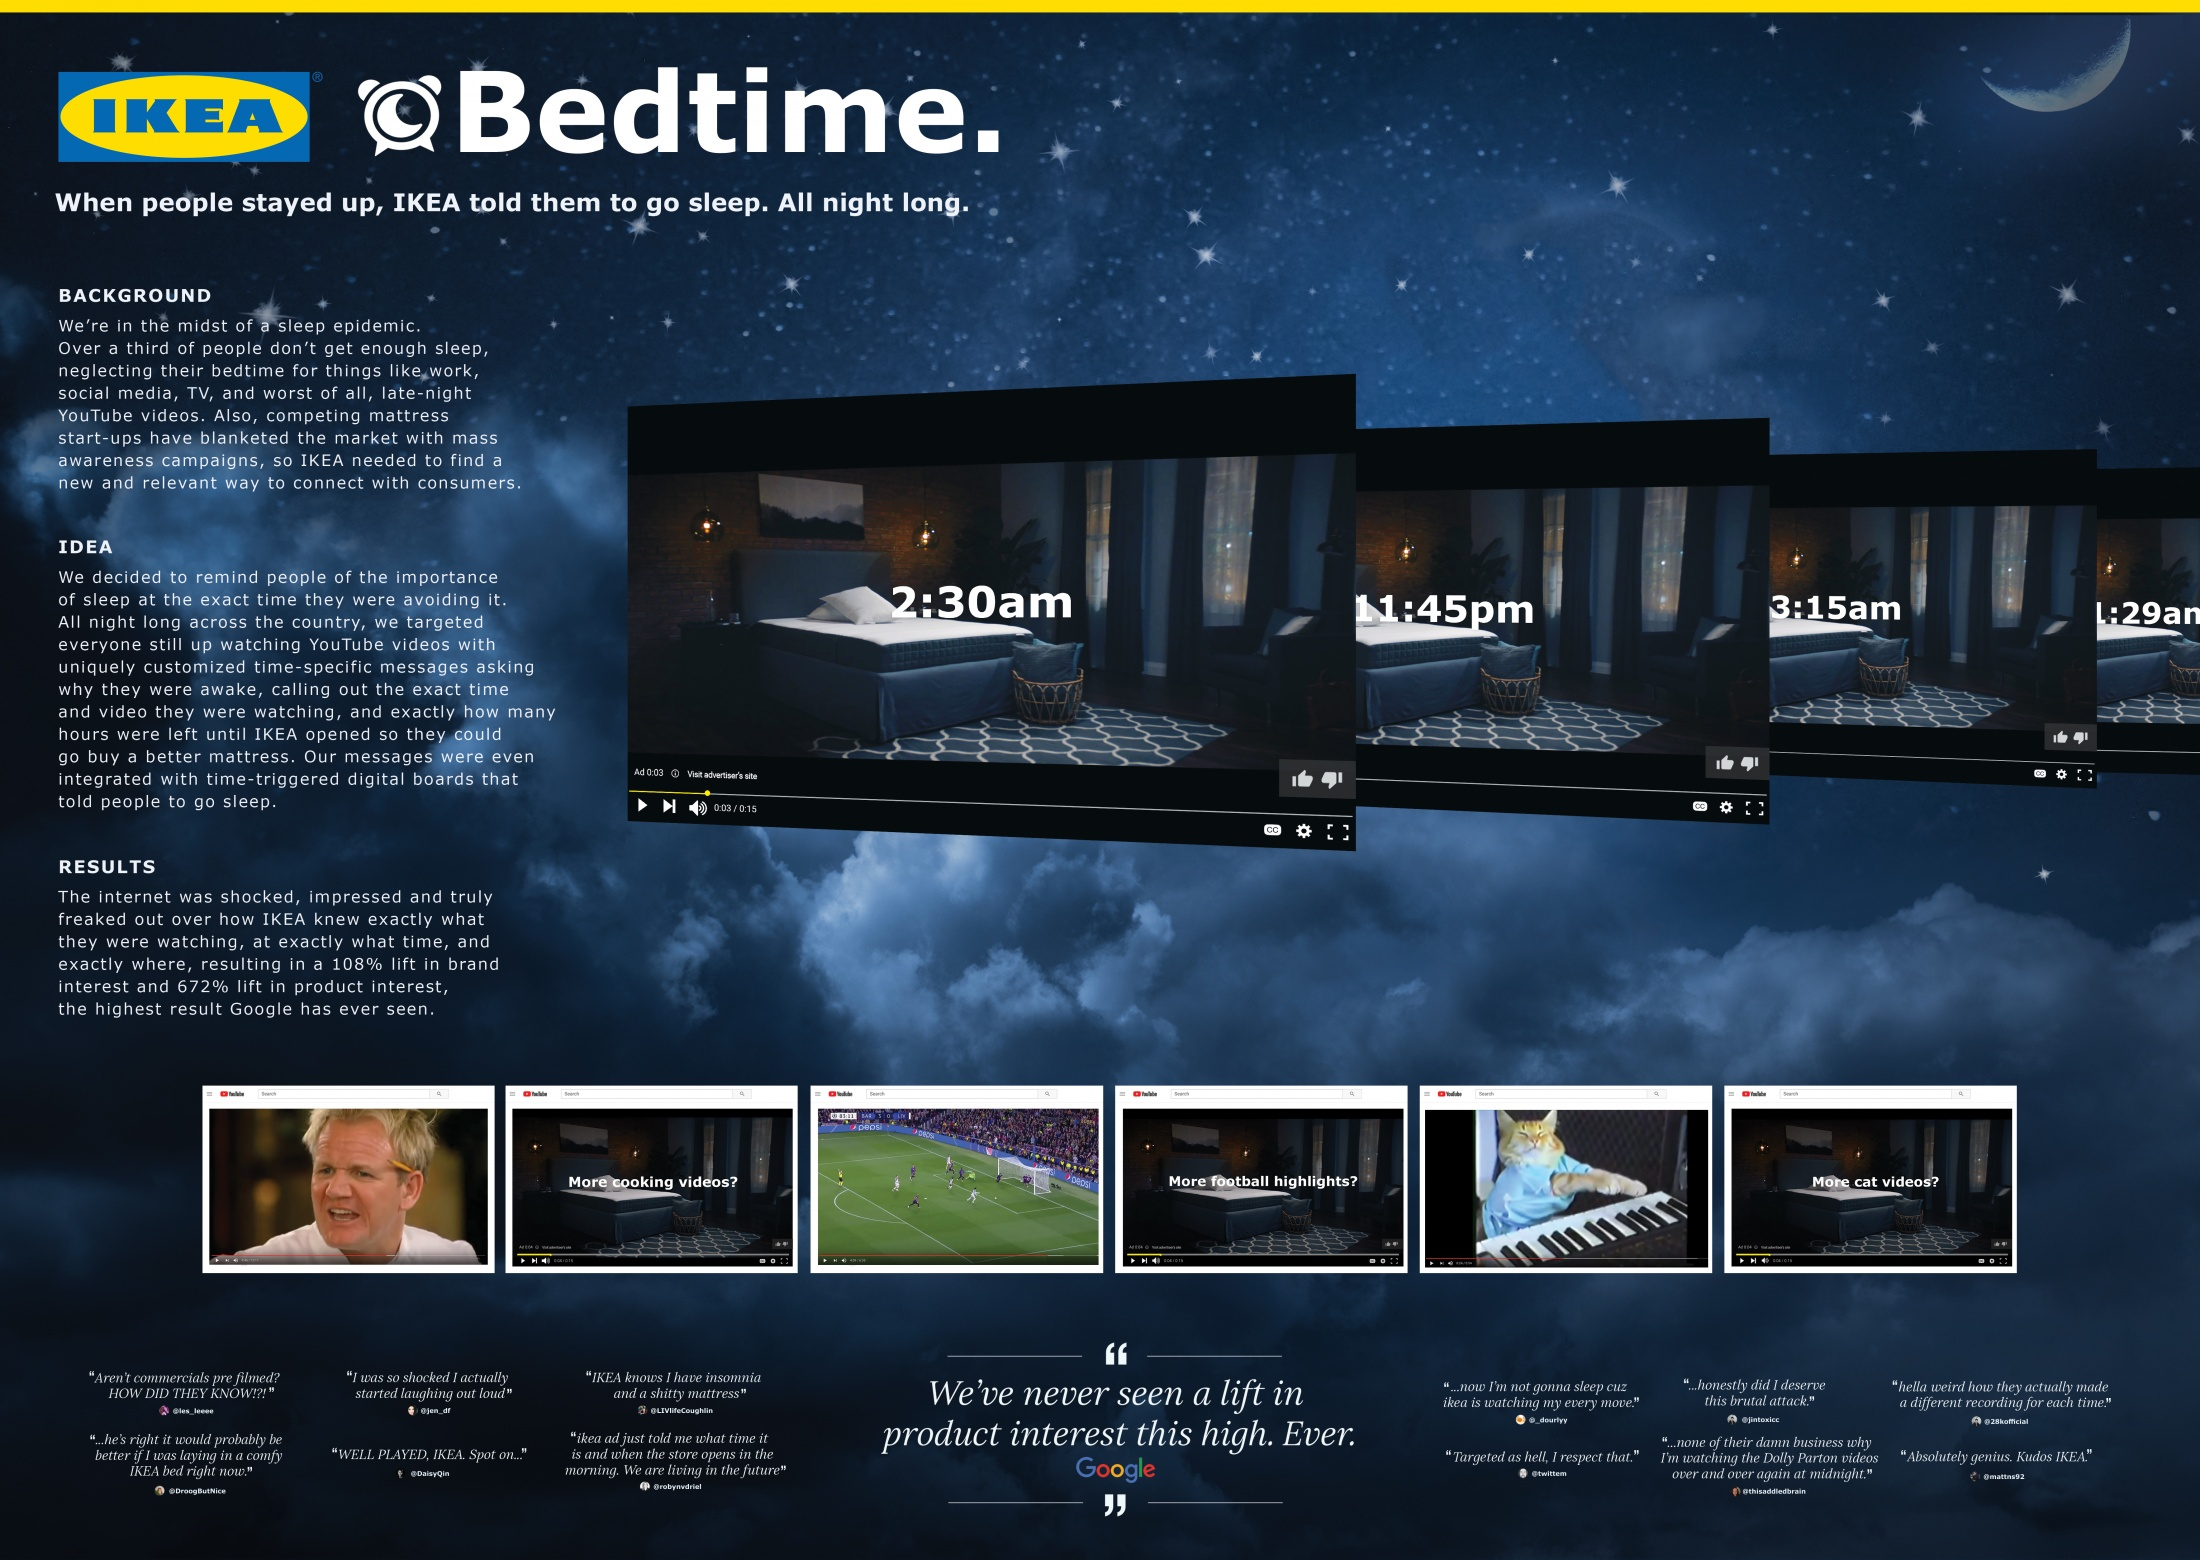 Thumbnail for IKEA Bedtime